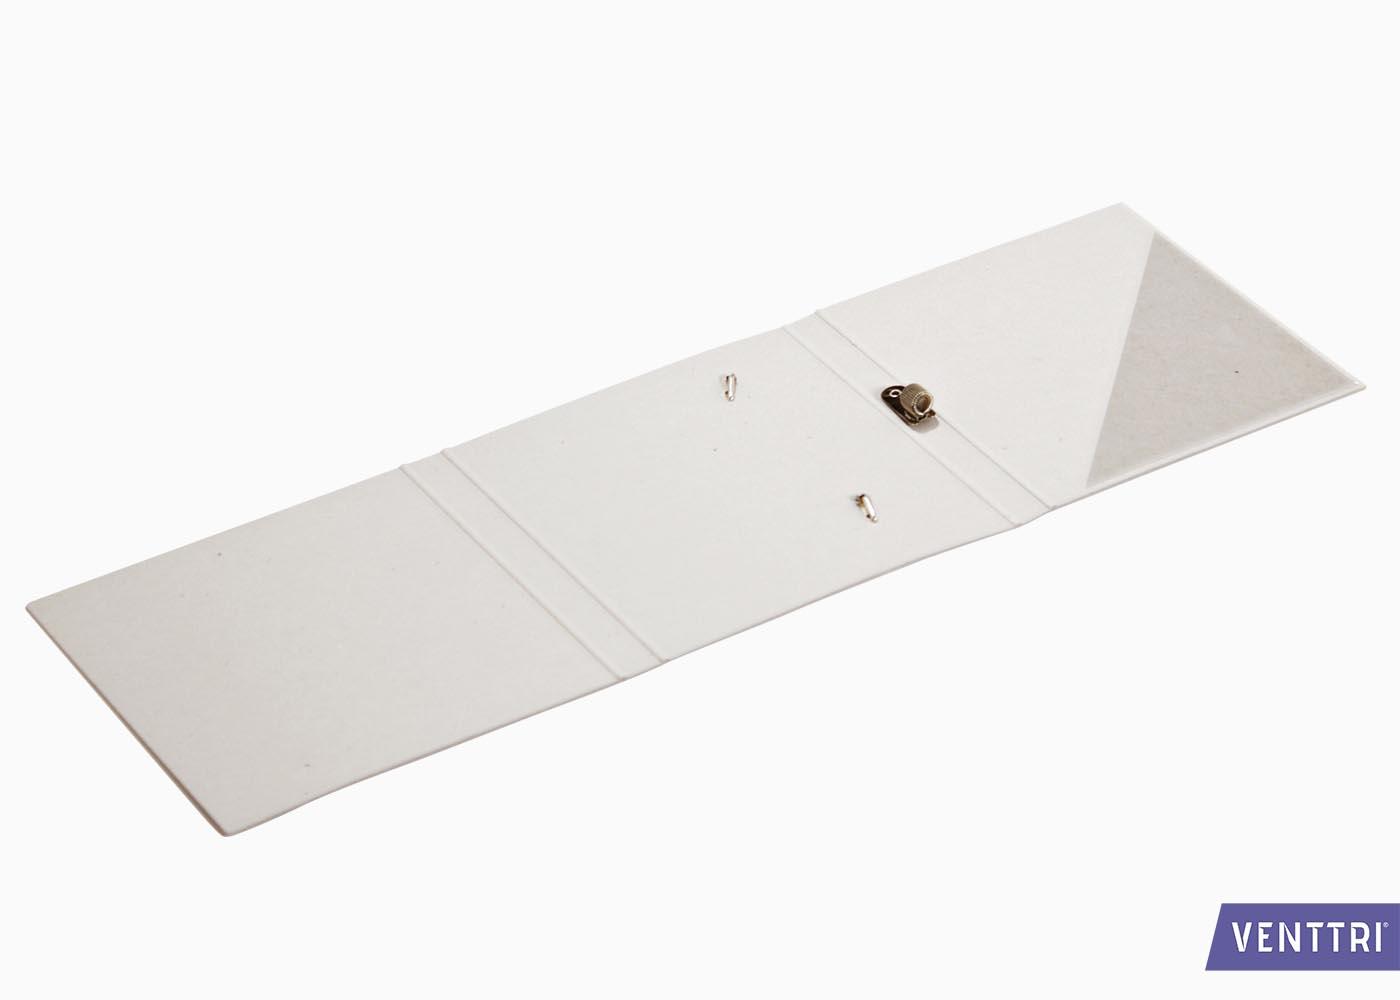 Vierkant mapje in grijsbord 3